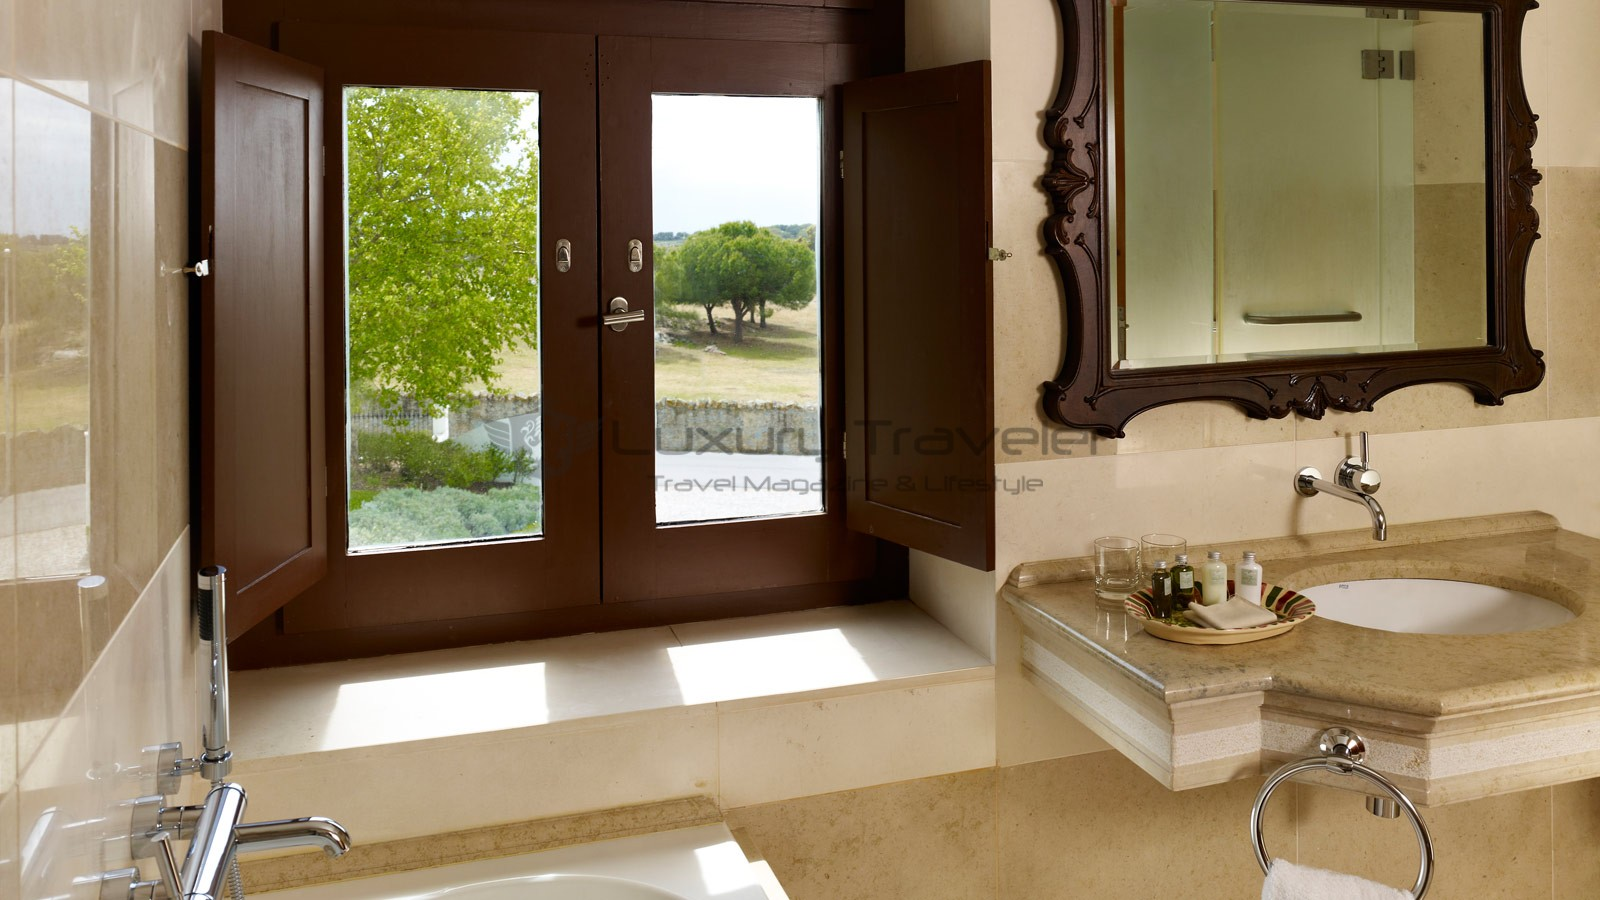 Convento_Espinheiro_Hotel_Evora_Starwood_Heritage_Bathroom